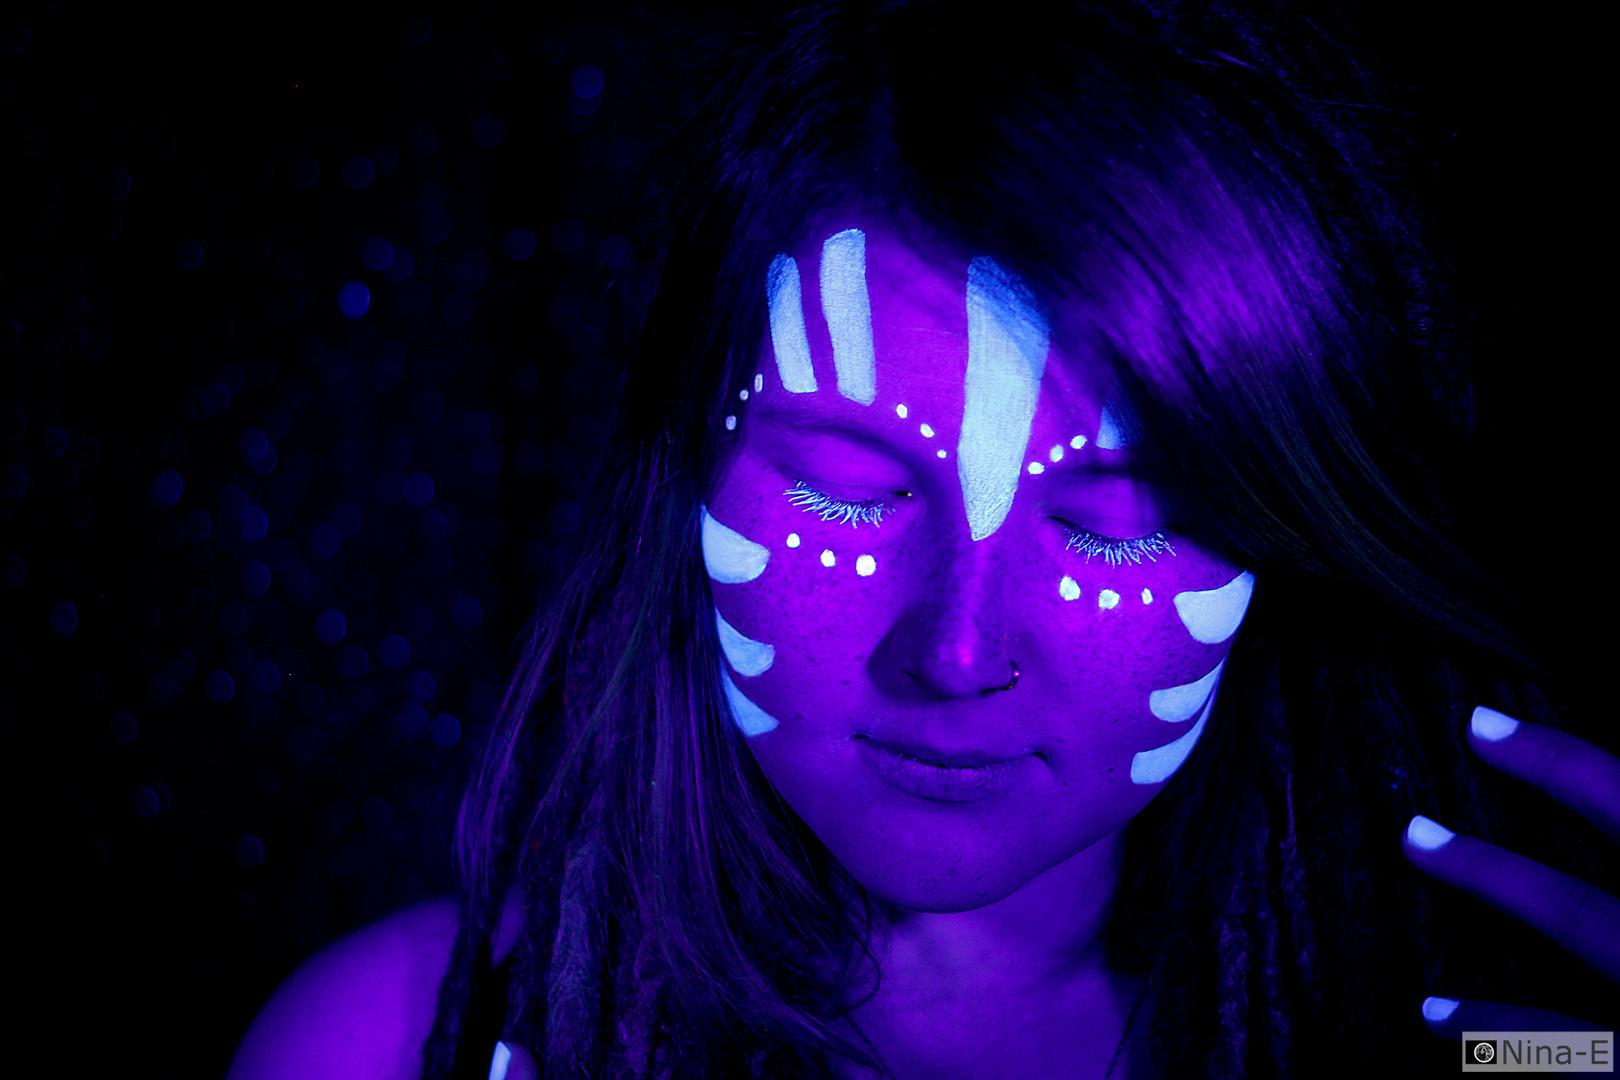 UV Lights III – Avatar Style